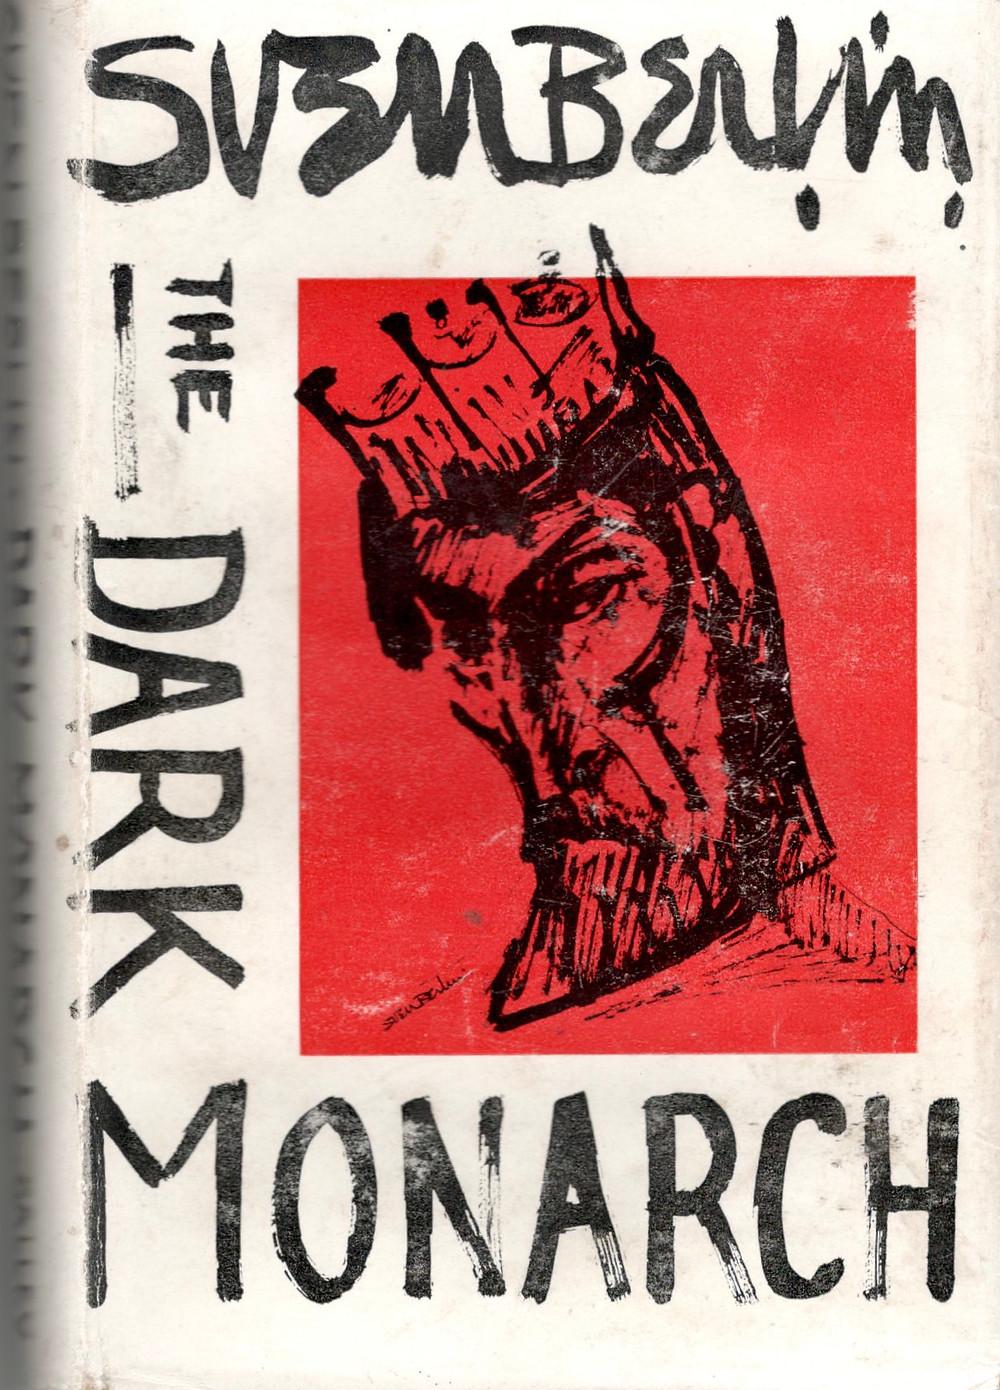 The Dark Monarch by Sven Berlin original edition for sale.